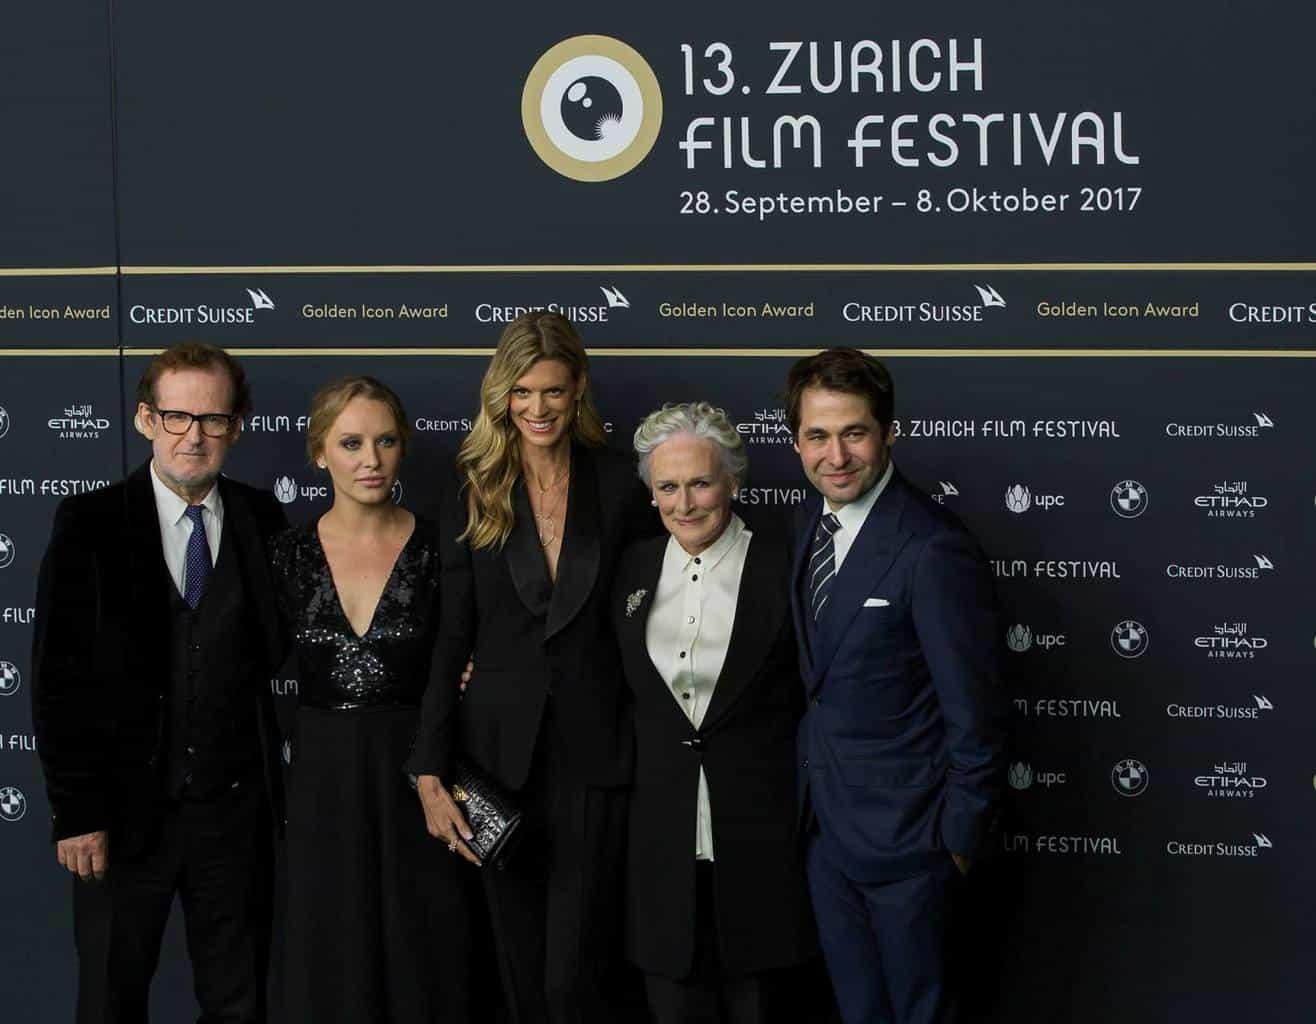 Glenn Close with her daughter Annie Starke and director Bjorn Ranke, Nadja Schildknecht and Karl Spoerri